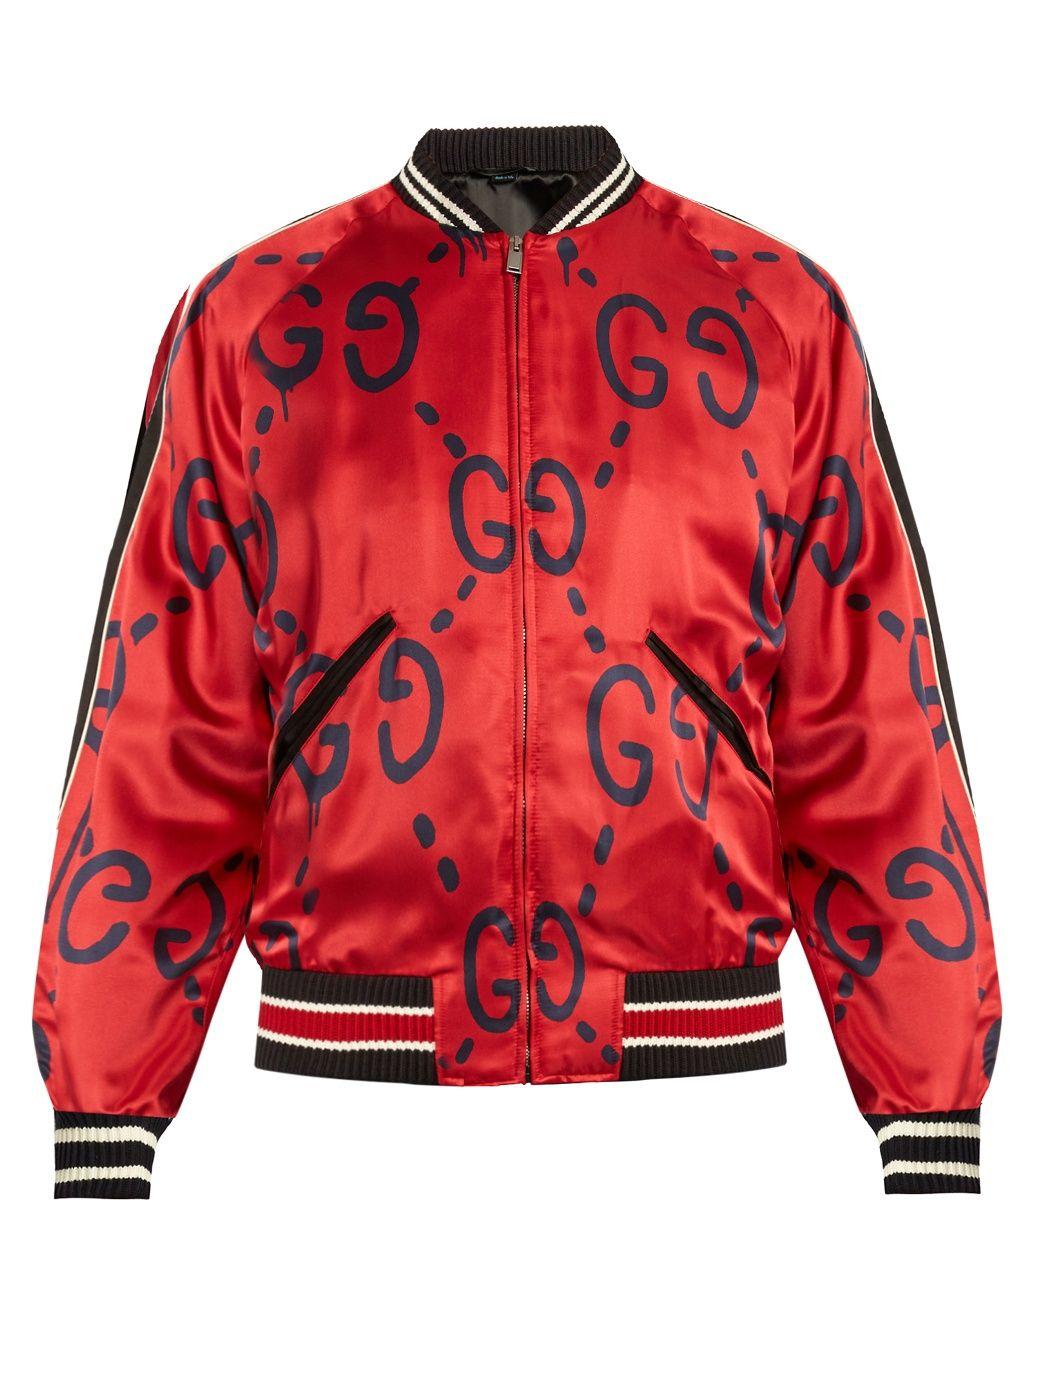 Bomber En Satin A Imprime Guccighost Gucci Matchesfashion Fr Satin Bomber Jacket Mens Flight Jacket Bomber Jacket [ 1392 x 1044 Pixel ]